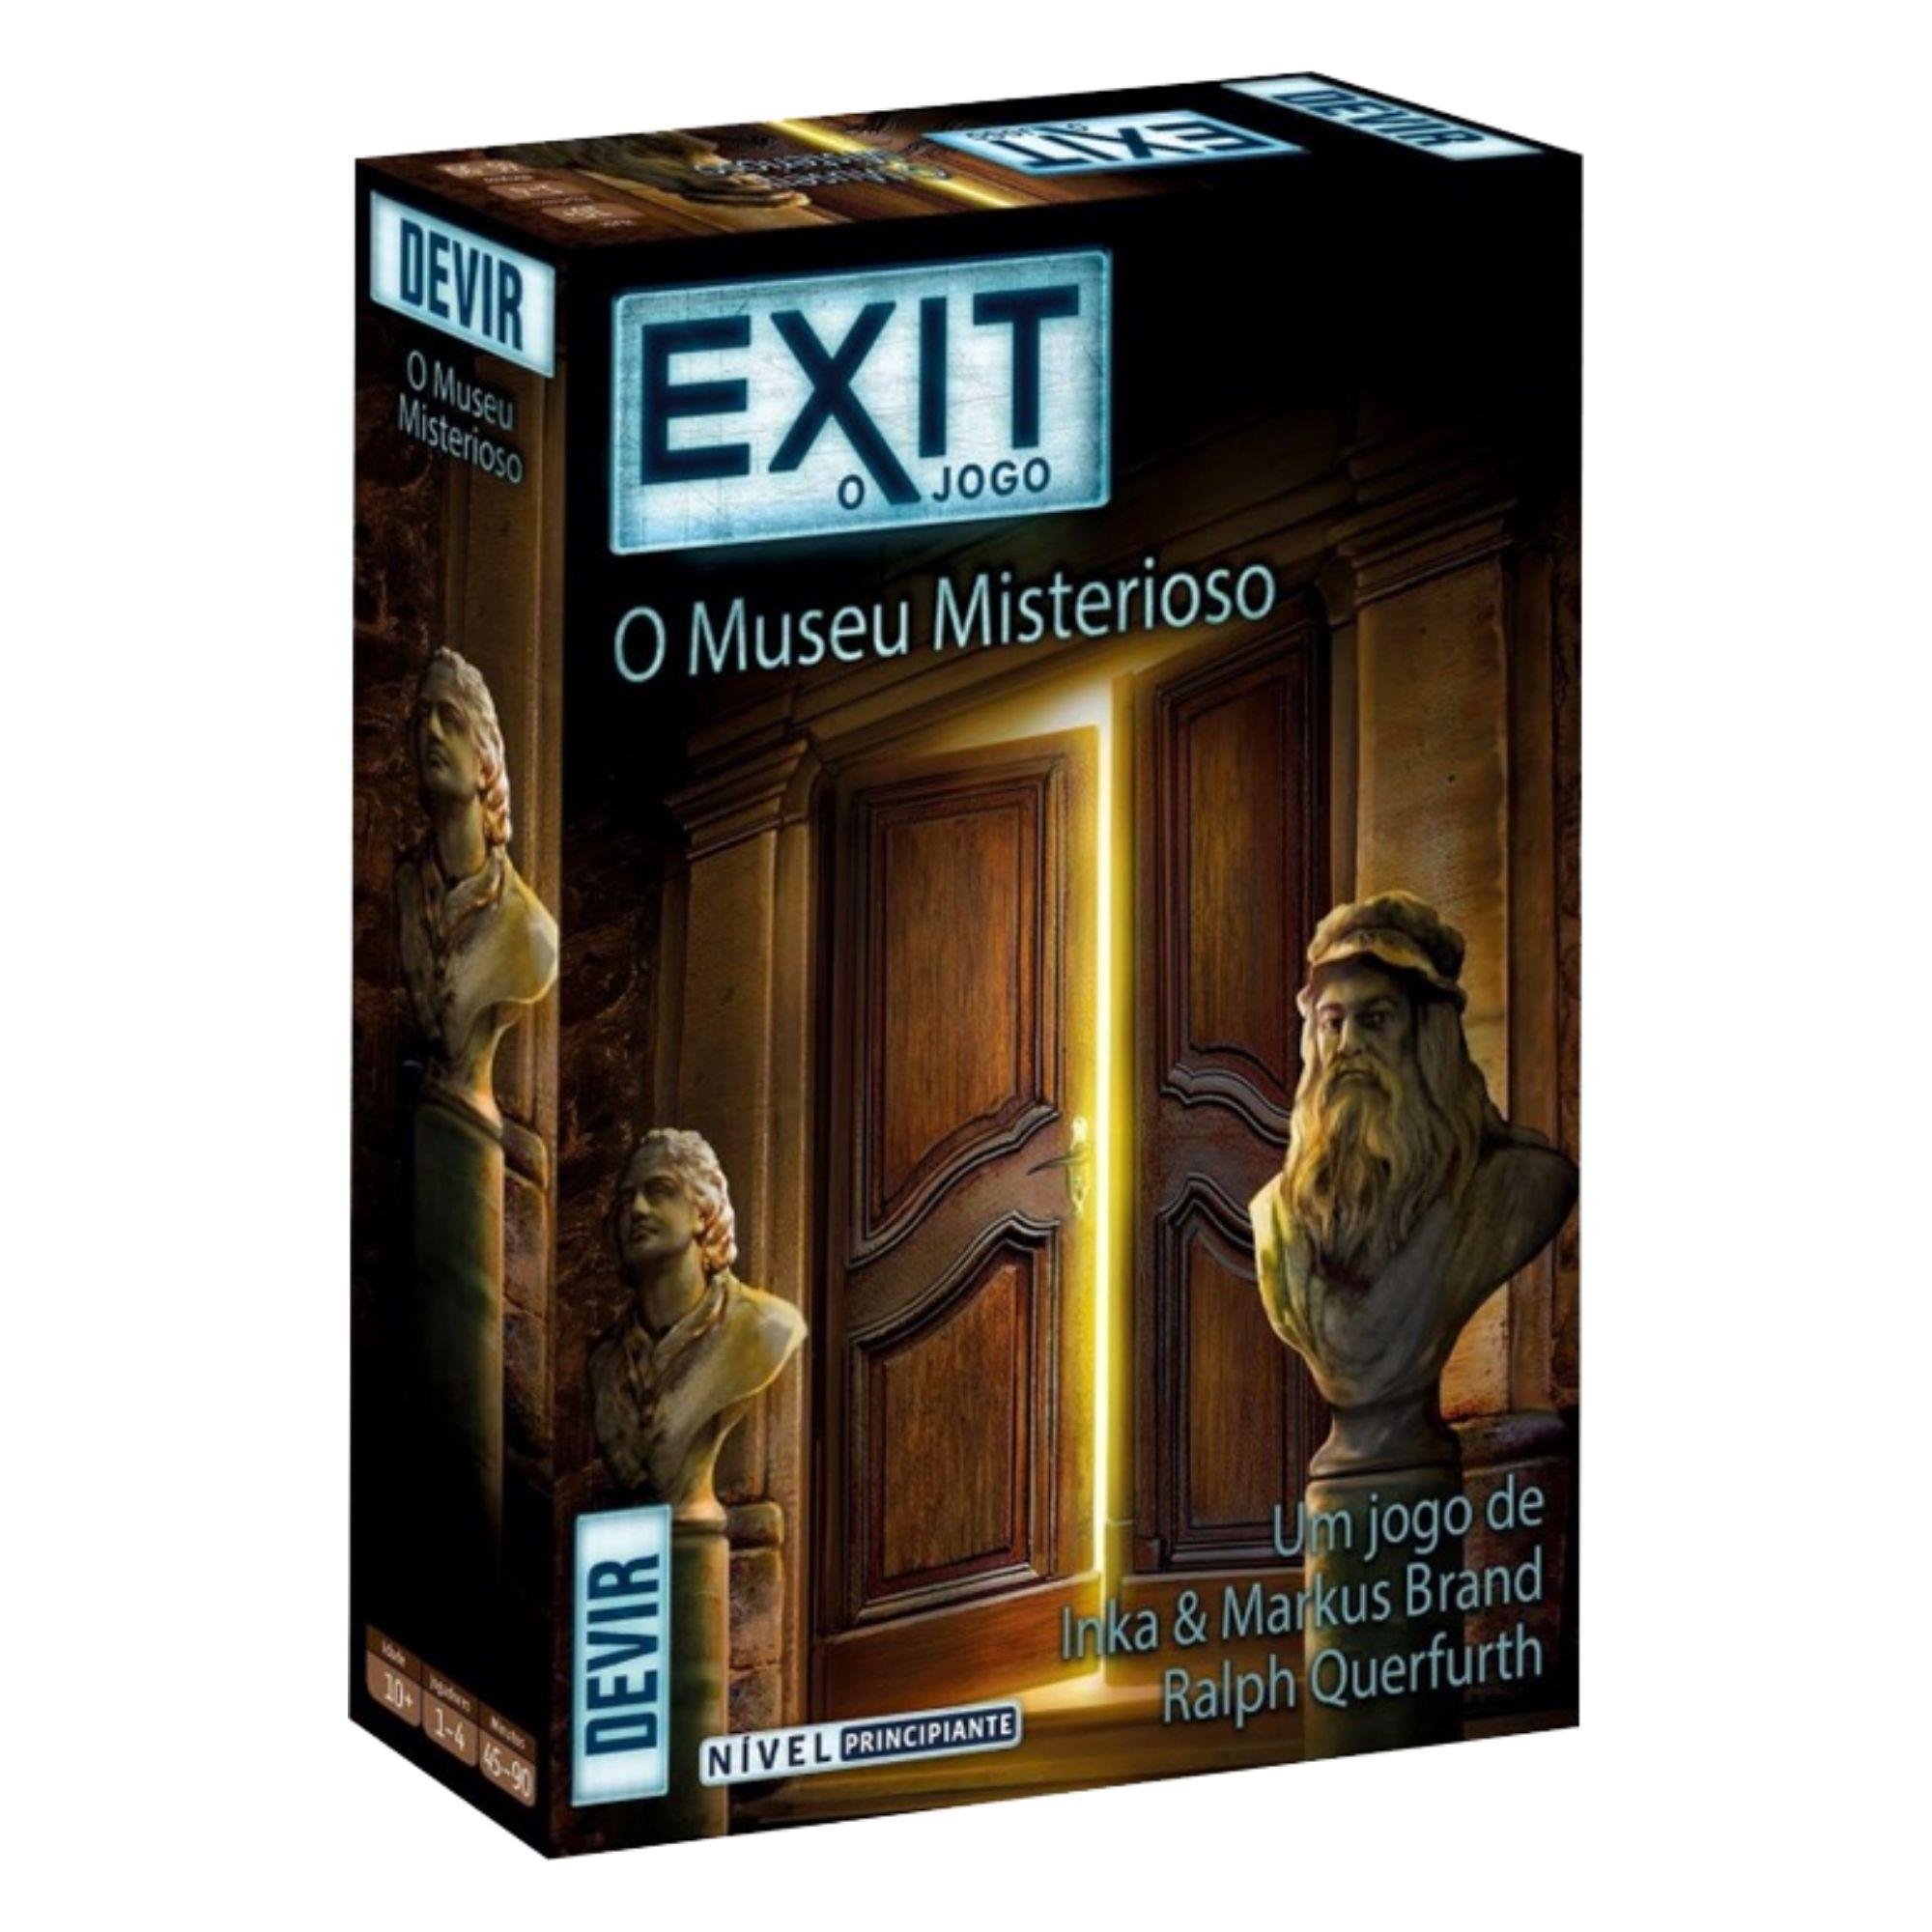 Exit, O Museu Misterioso